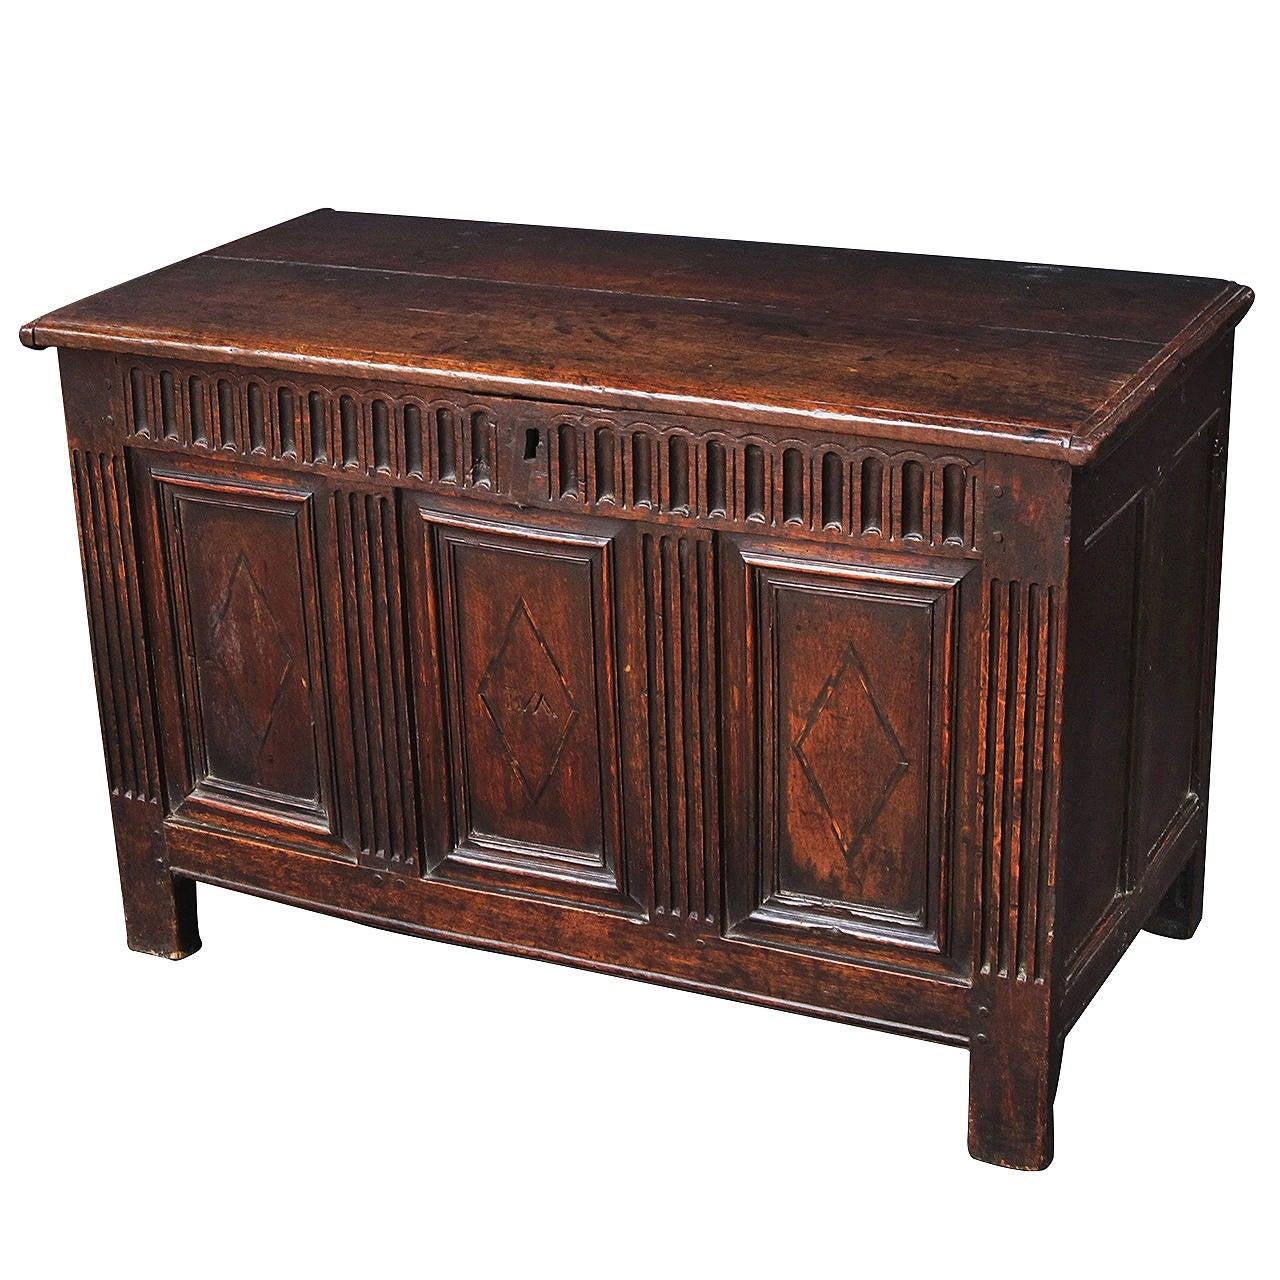 Antique Furniture English Oak Jacobean Jacobean Style Chair Furniture